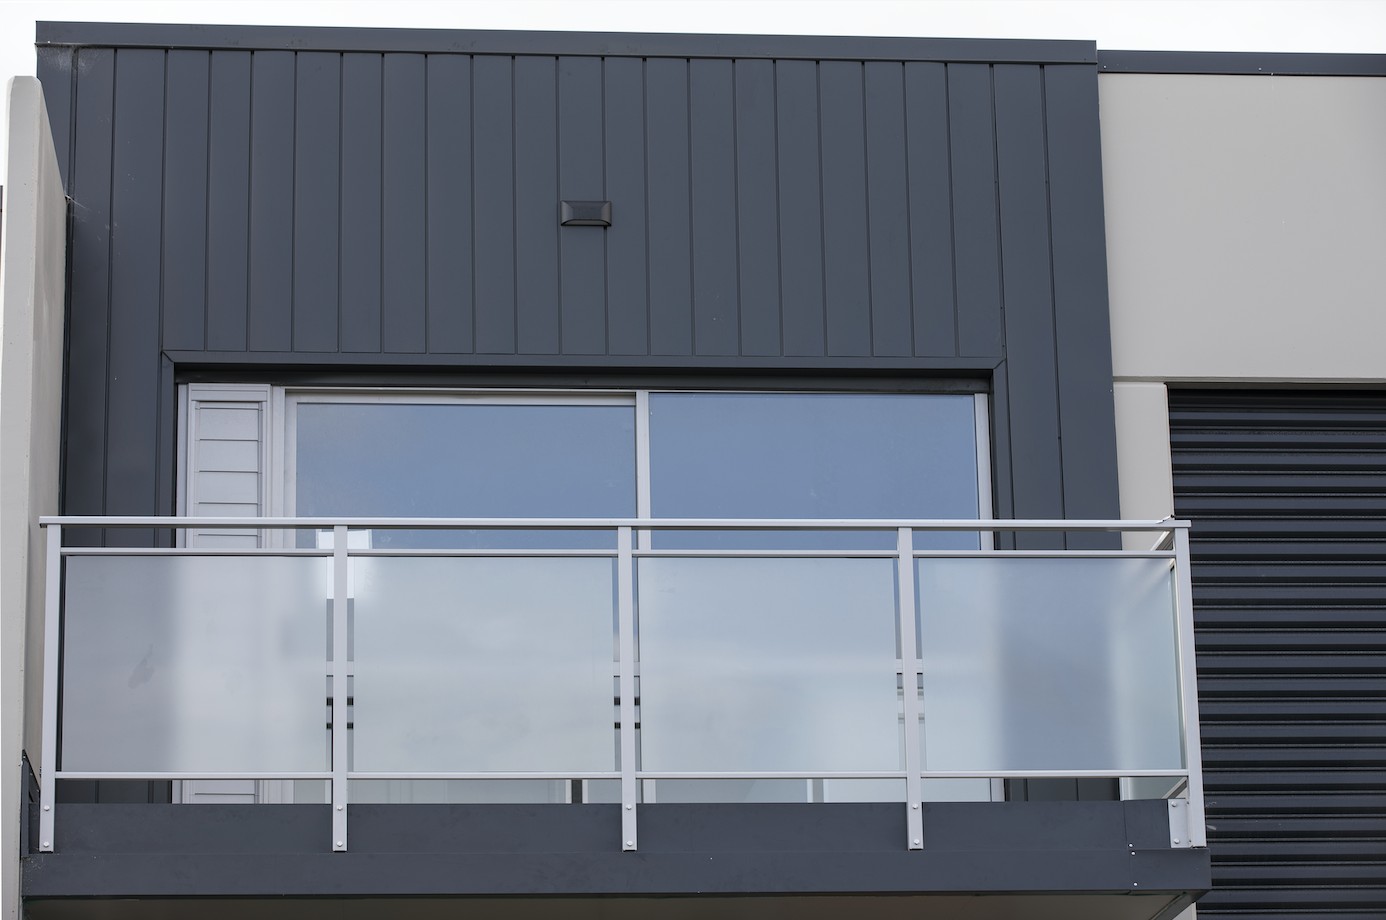 The-Roofing-Store-Steel-Metal-Interlocking-Panel-Windsor-grey-2-LR.png